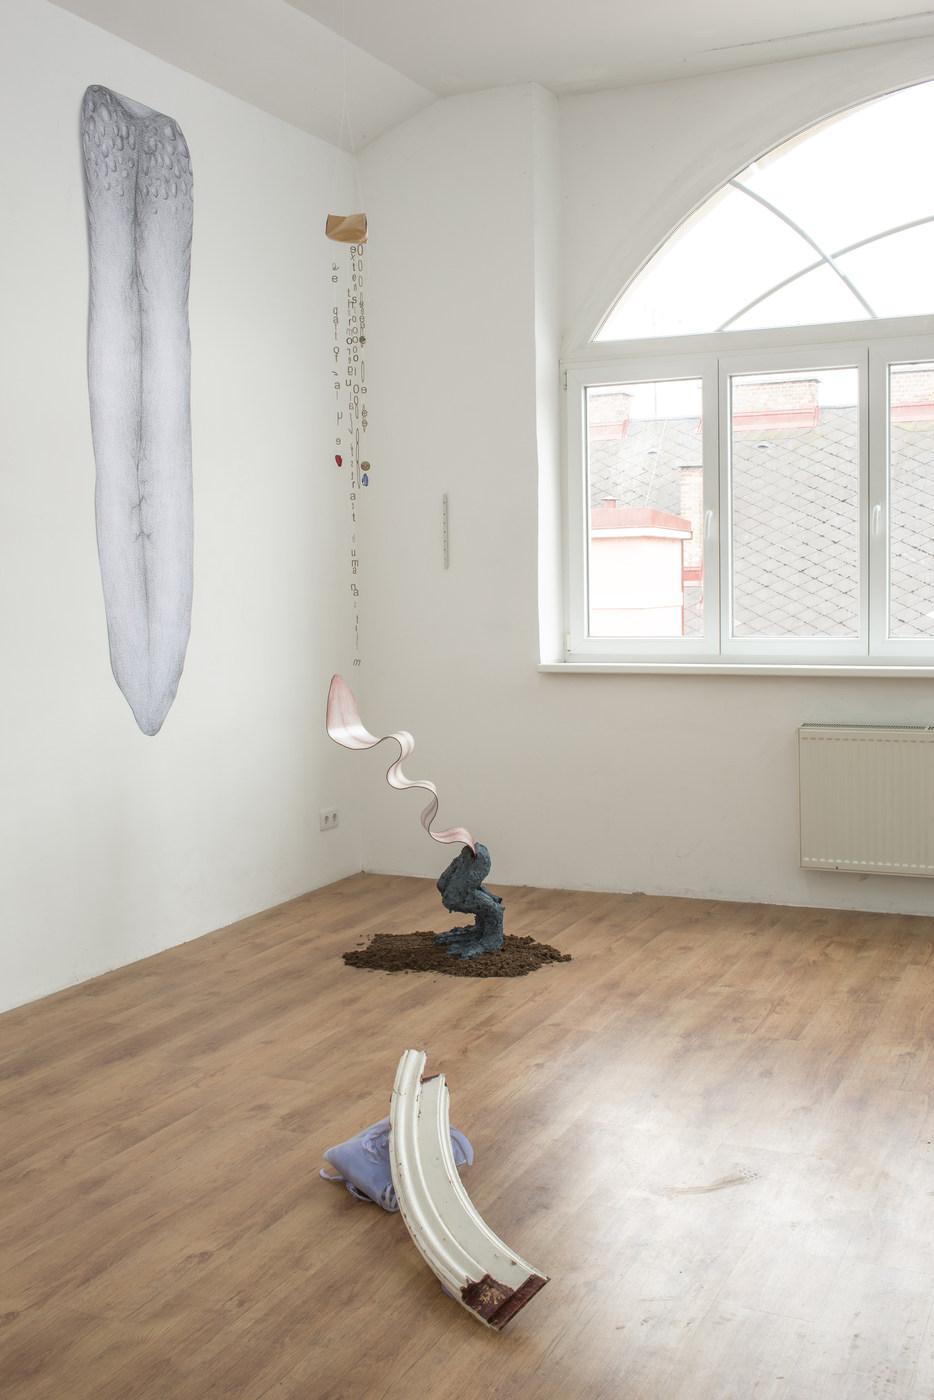 installation shot 2